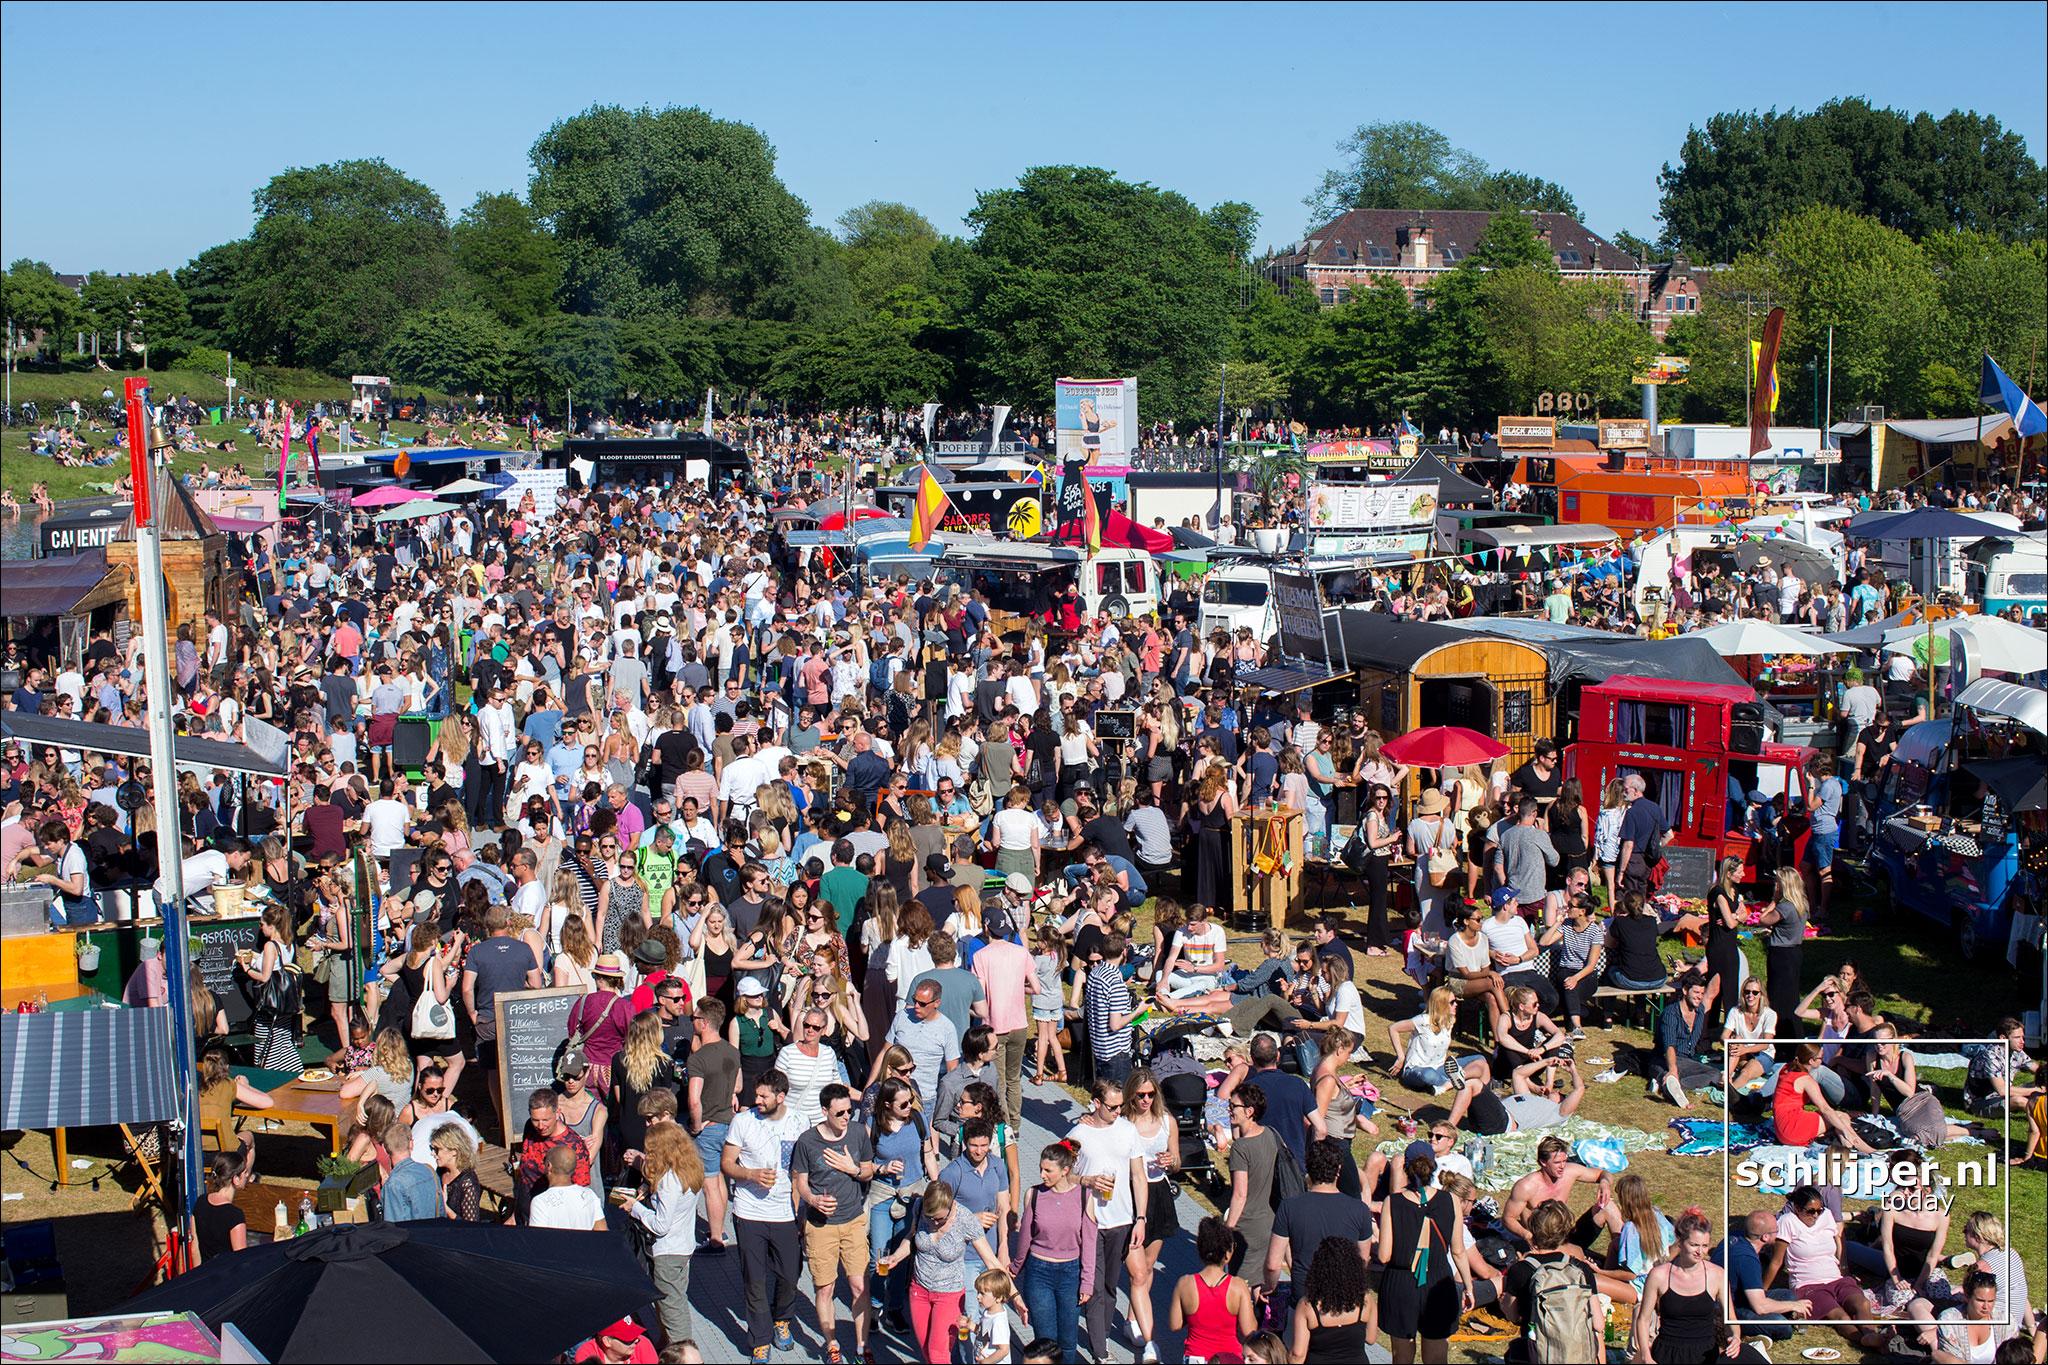 De Rollende Keukens : Schlijper.nl today thu may 25 2017 17:44 img 2441 westerpark